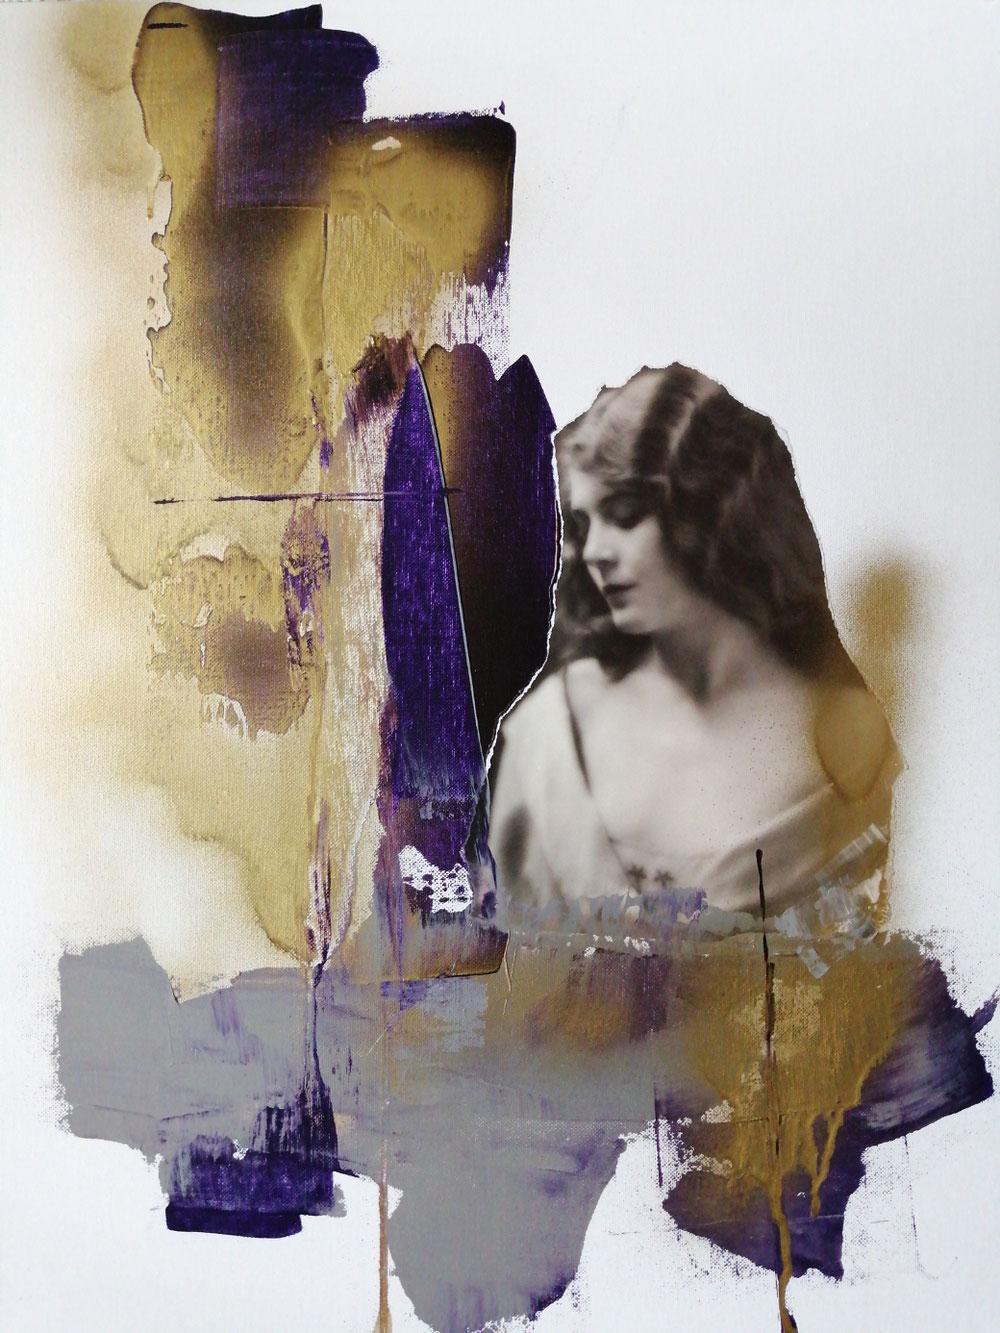 Ohne Titel. Acryl, Papier, Goldspray auf Malkarton. 50x60 cm.